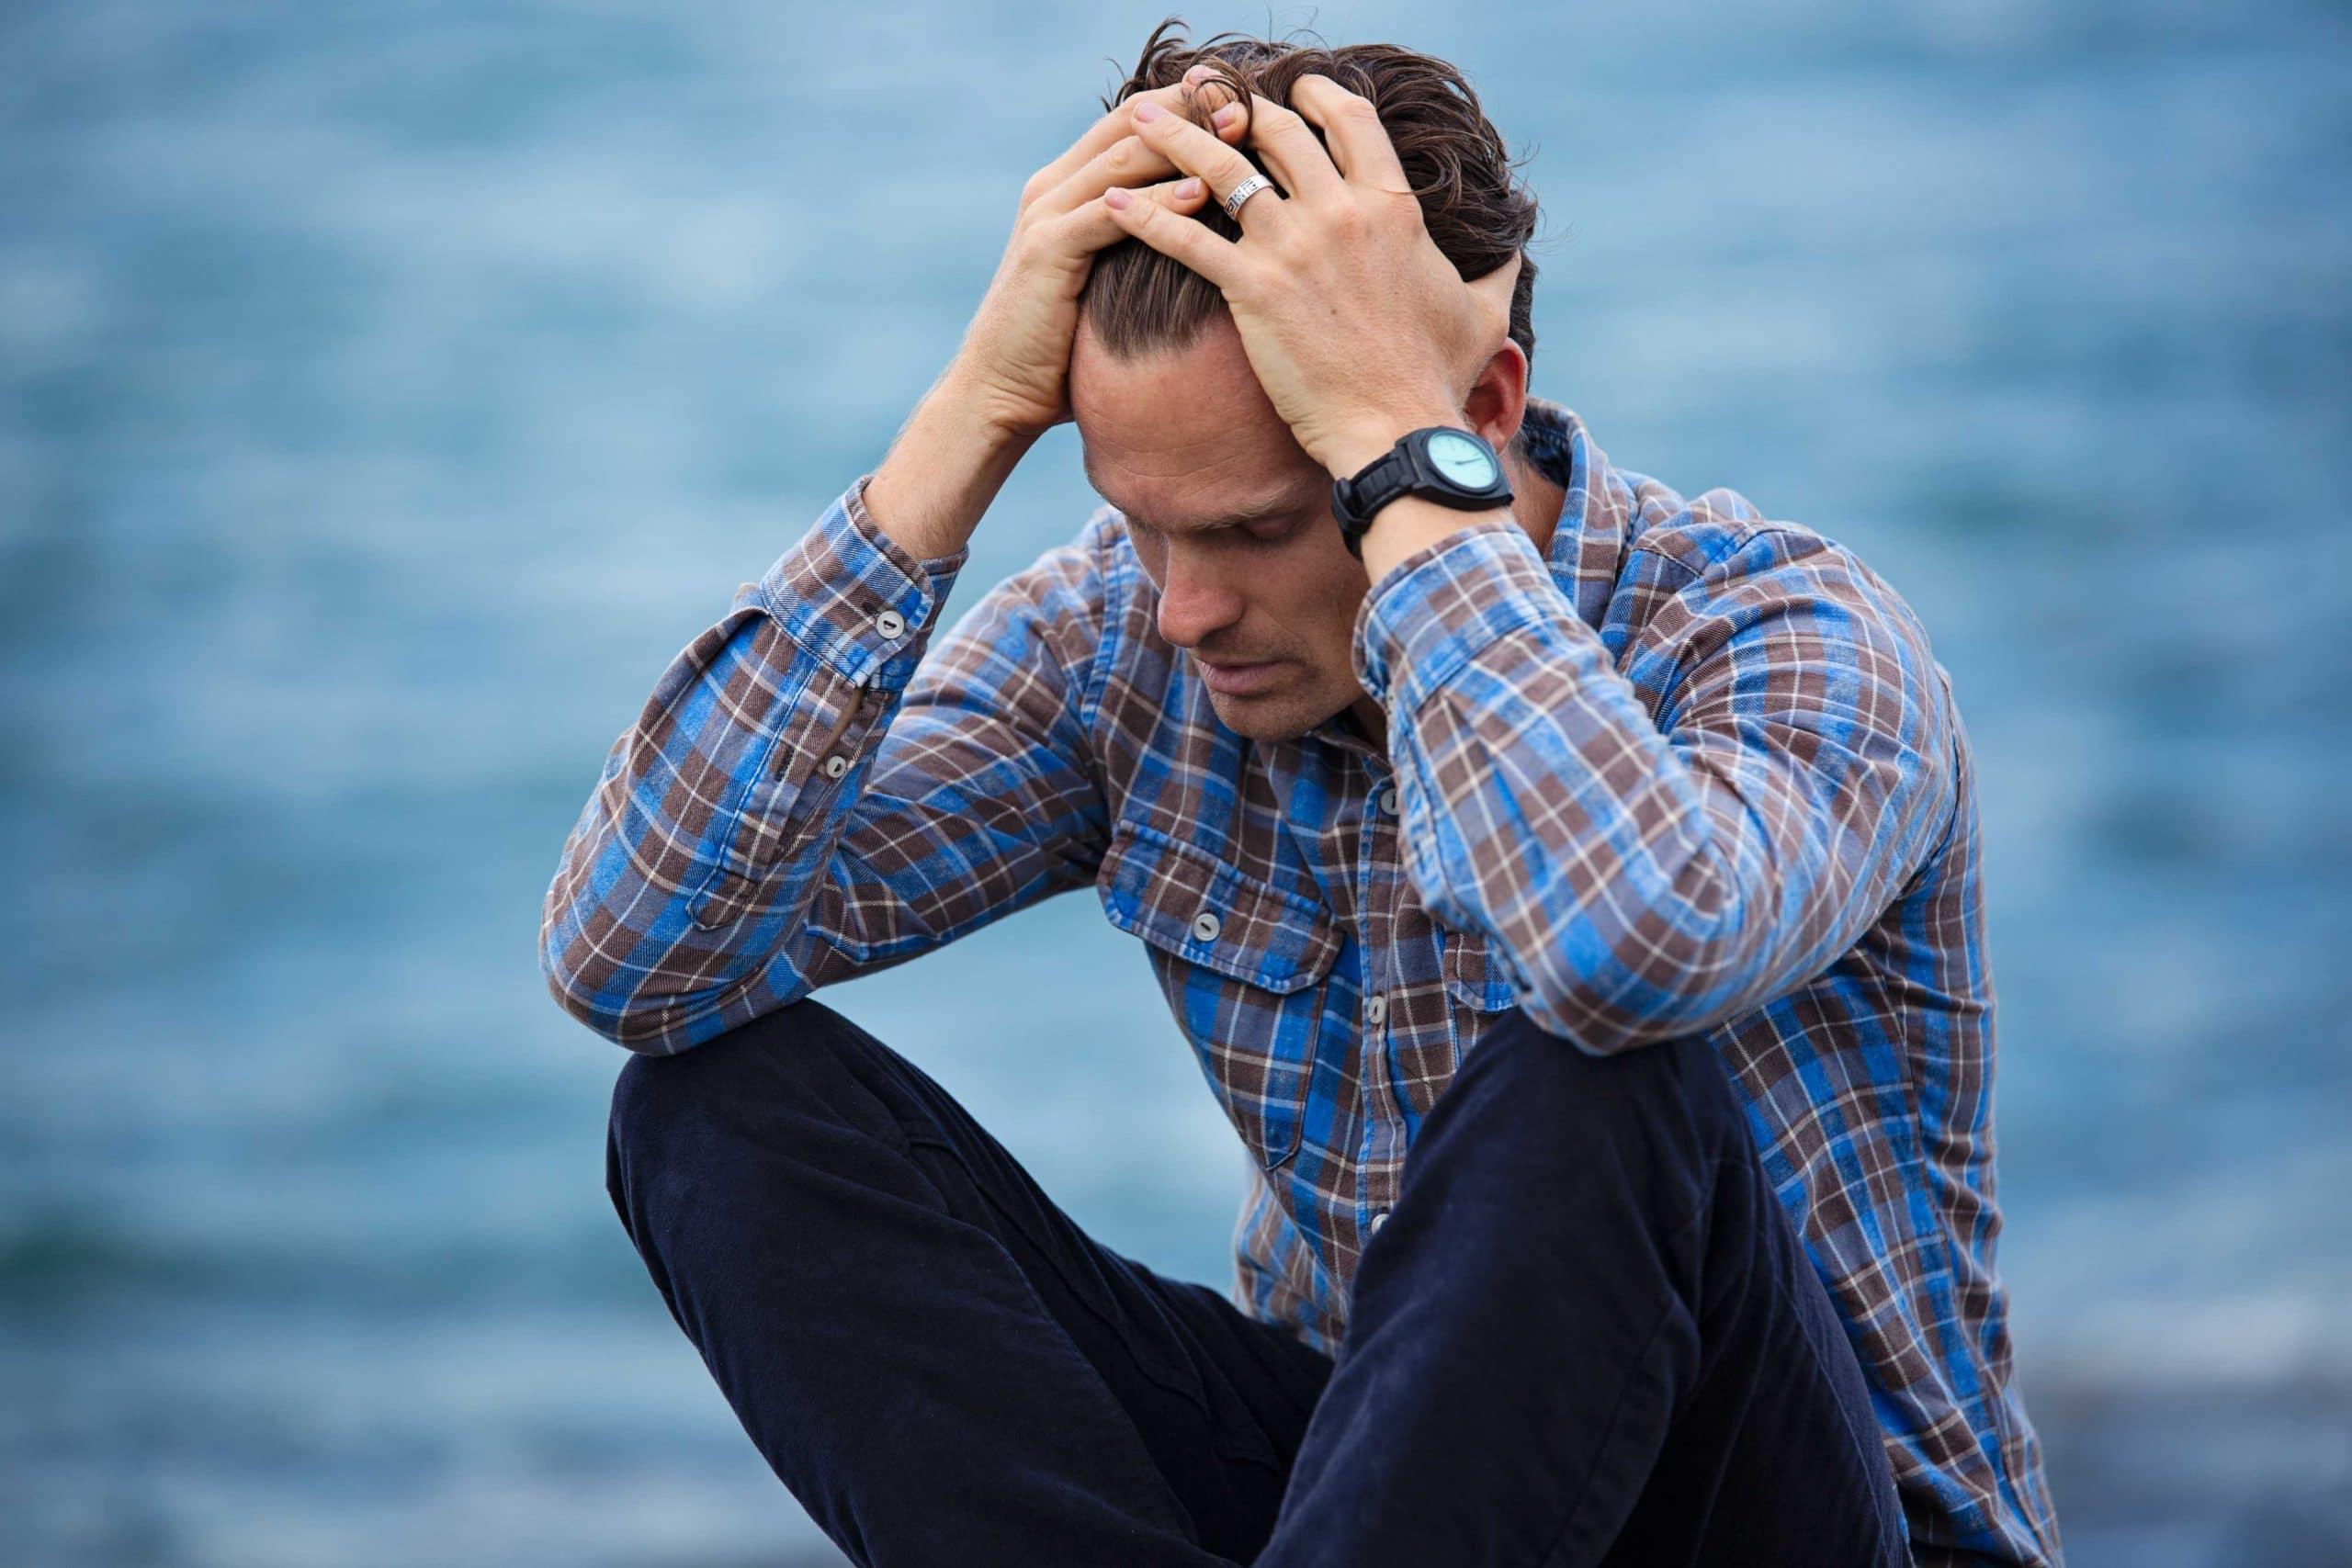 How do I help my stressed husband feel better